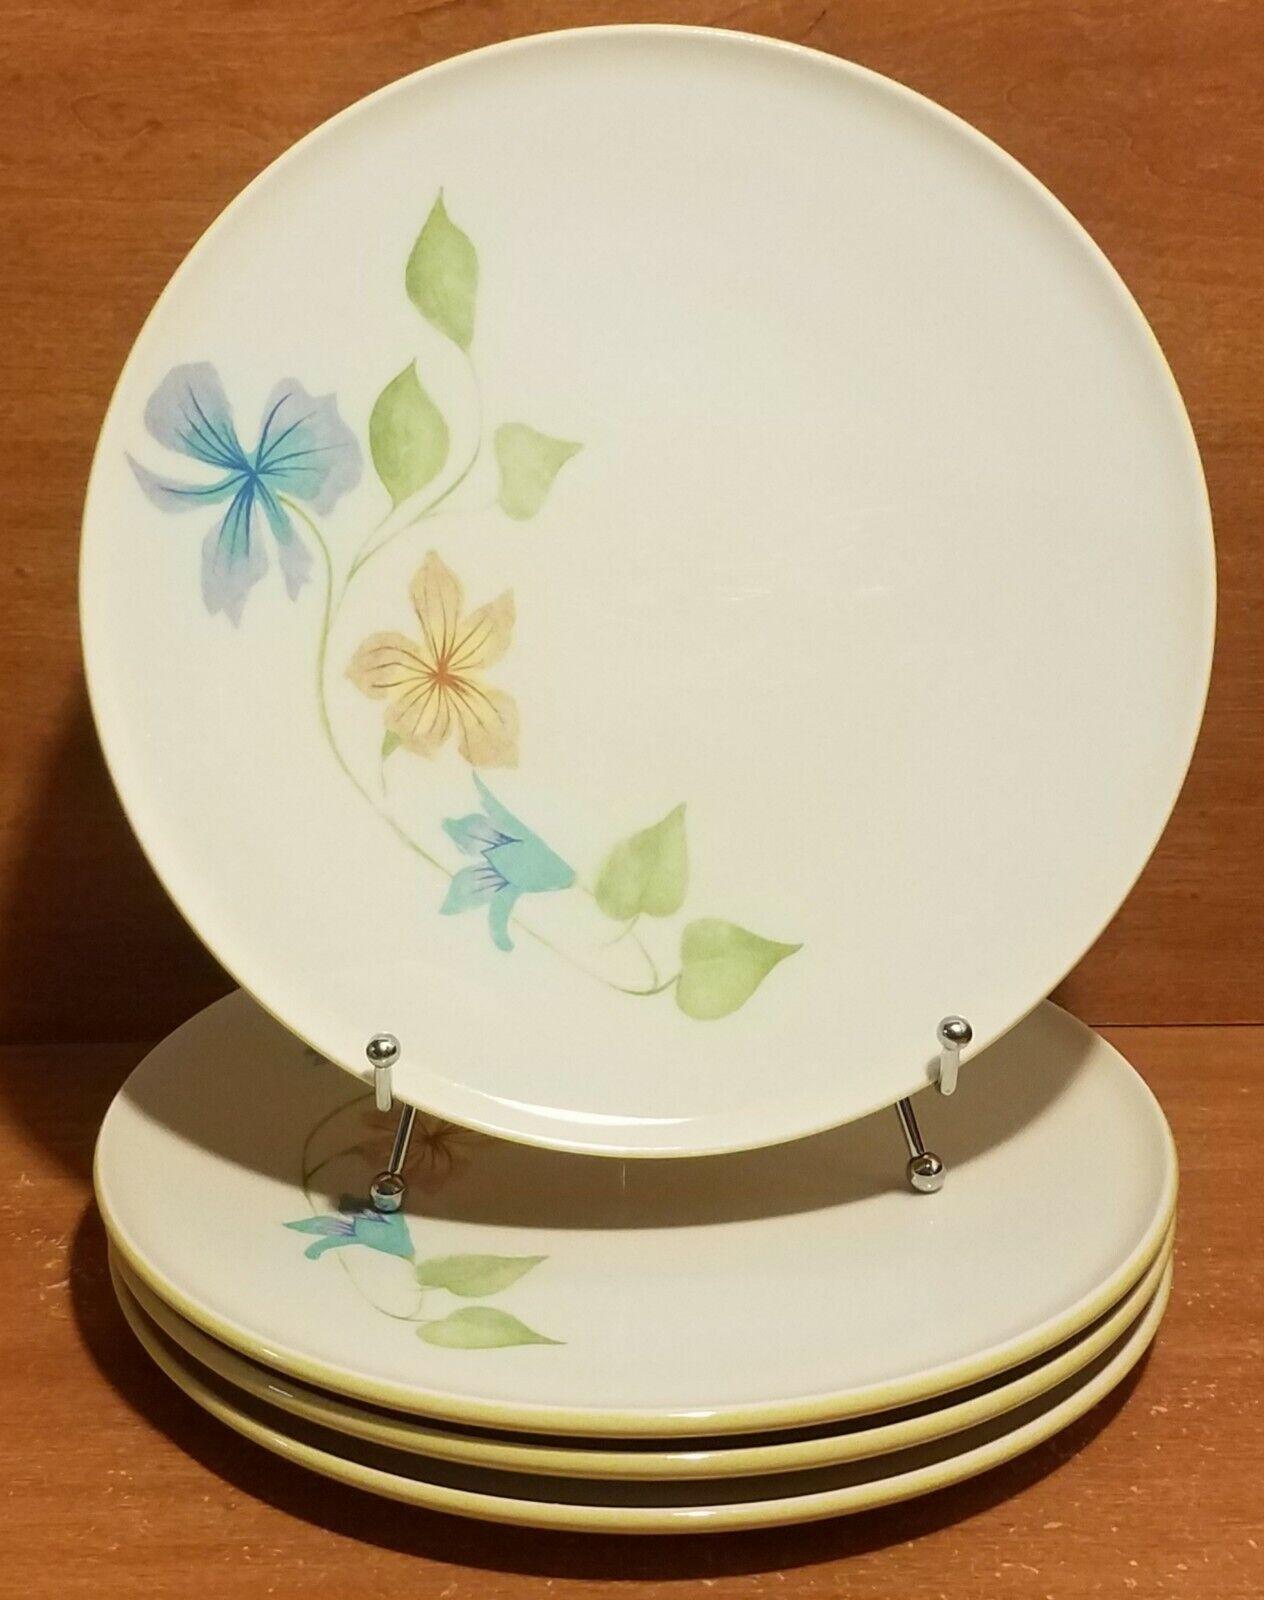 Iroquois InformaI SLEEPY HOLLOW Dinner plate set of 4, 10 3 8 , Ben Seibel, EUC